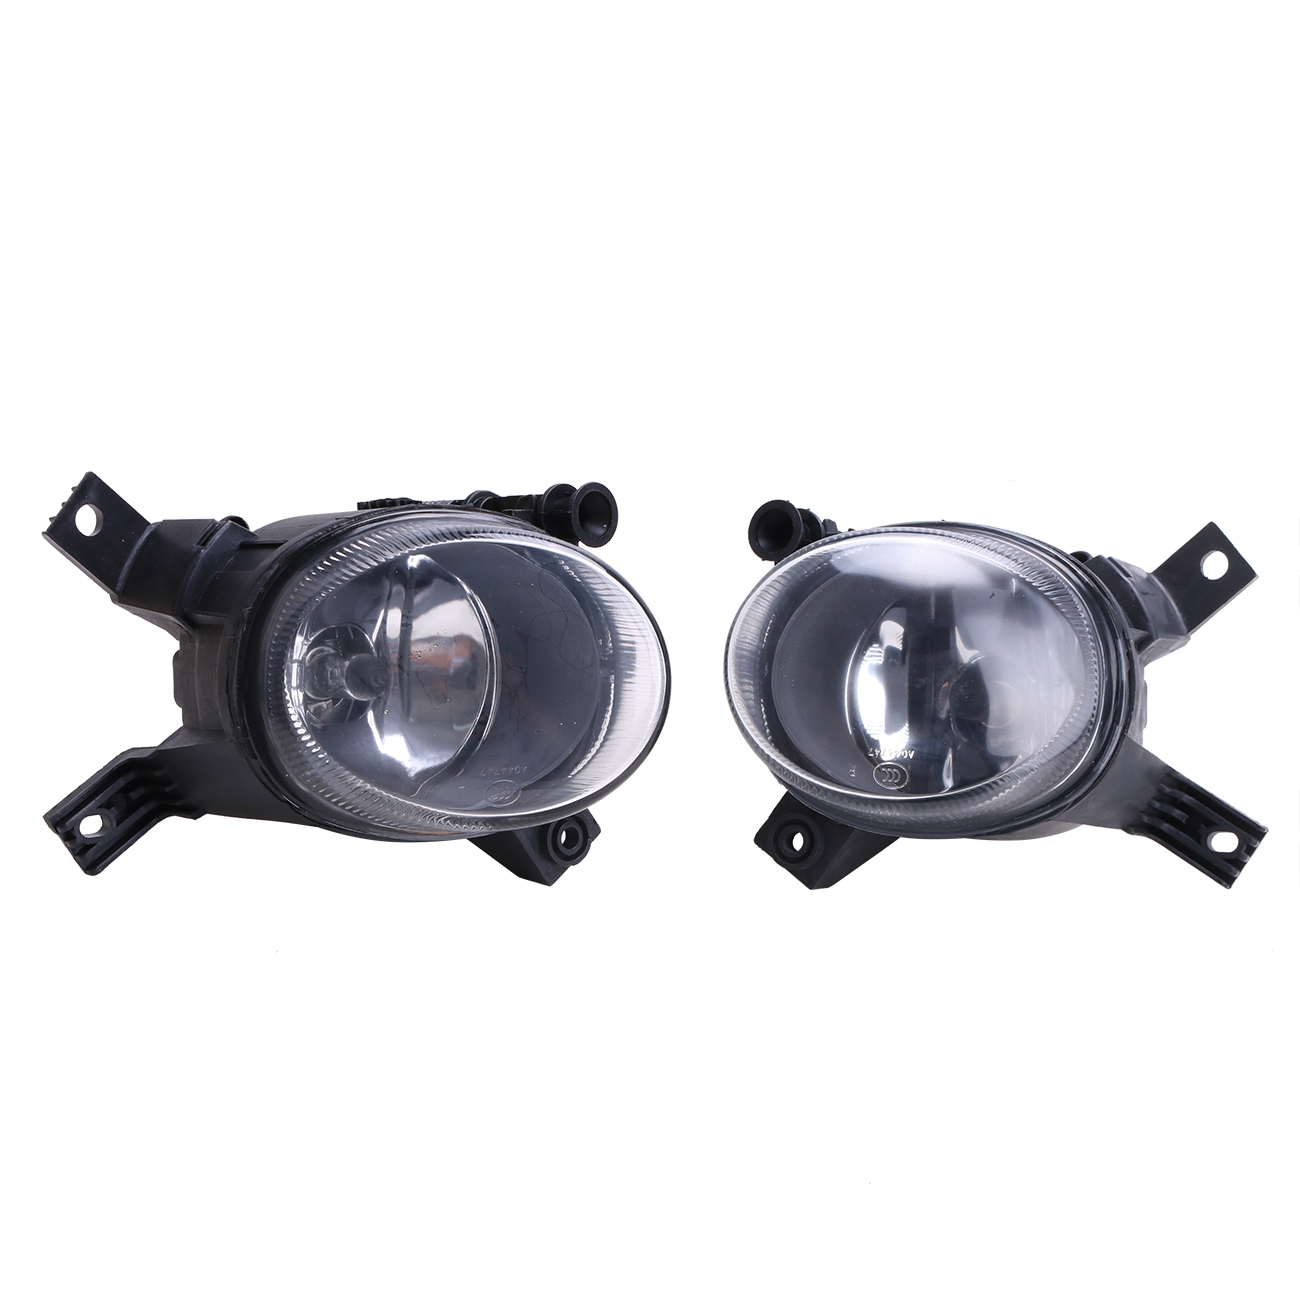 1 Pair Front Fog Light Lamps For Audi A4 A3 B7 2004-2008 Left + Right  8E0941699 8E0941699 // стоимость